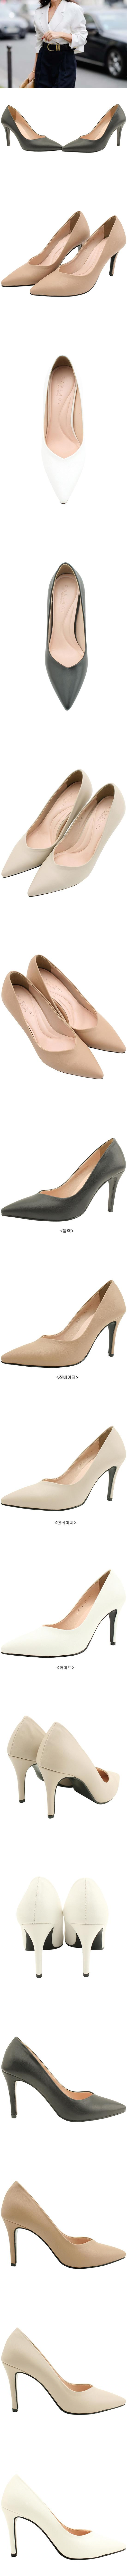 Slim Stiletto High Heels 9cm White